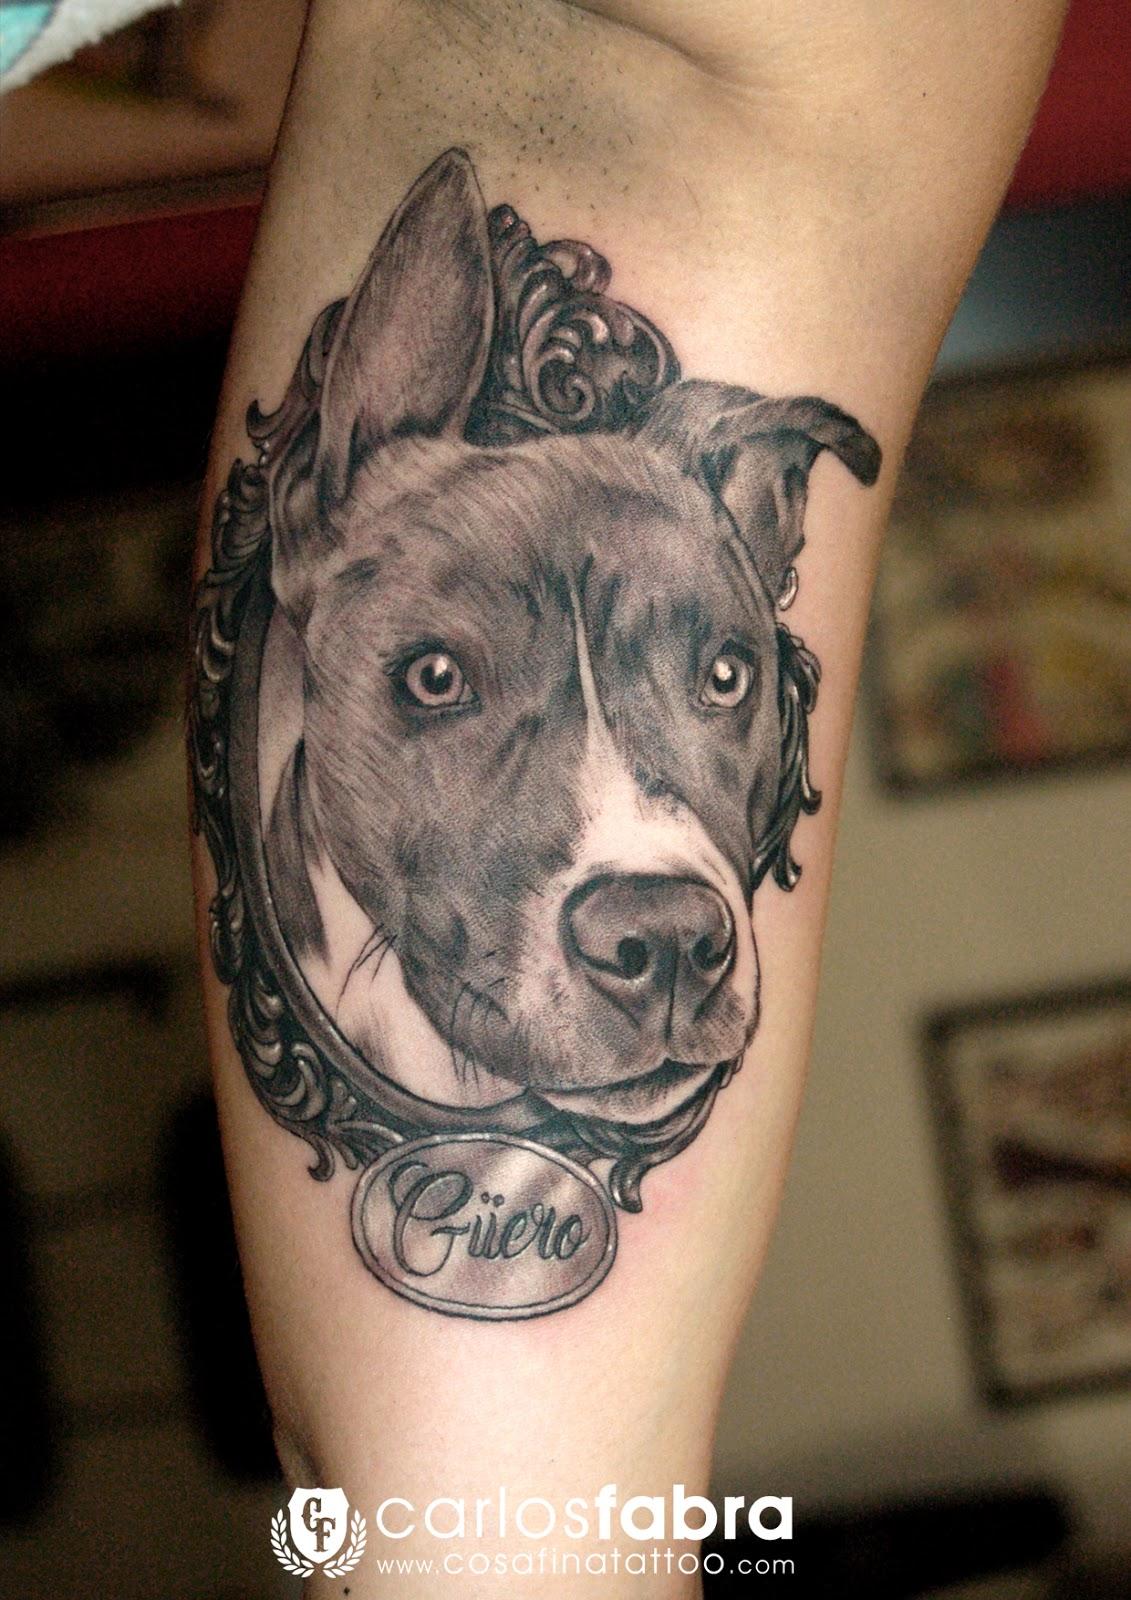 Excelente Marco De Fotos De Tatuajes Composición - Ideas ...